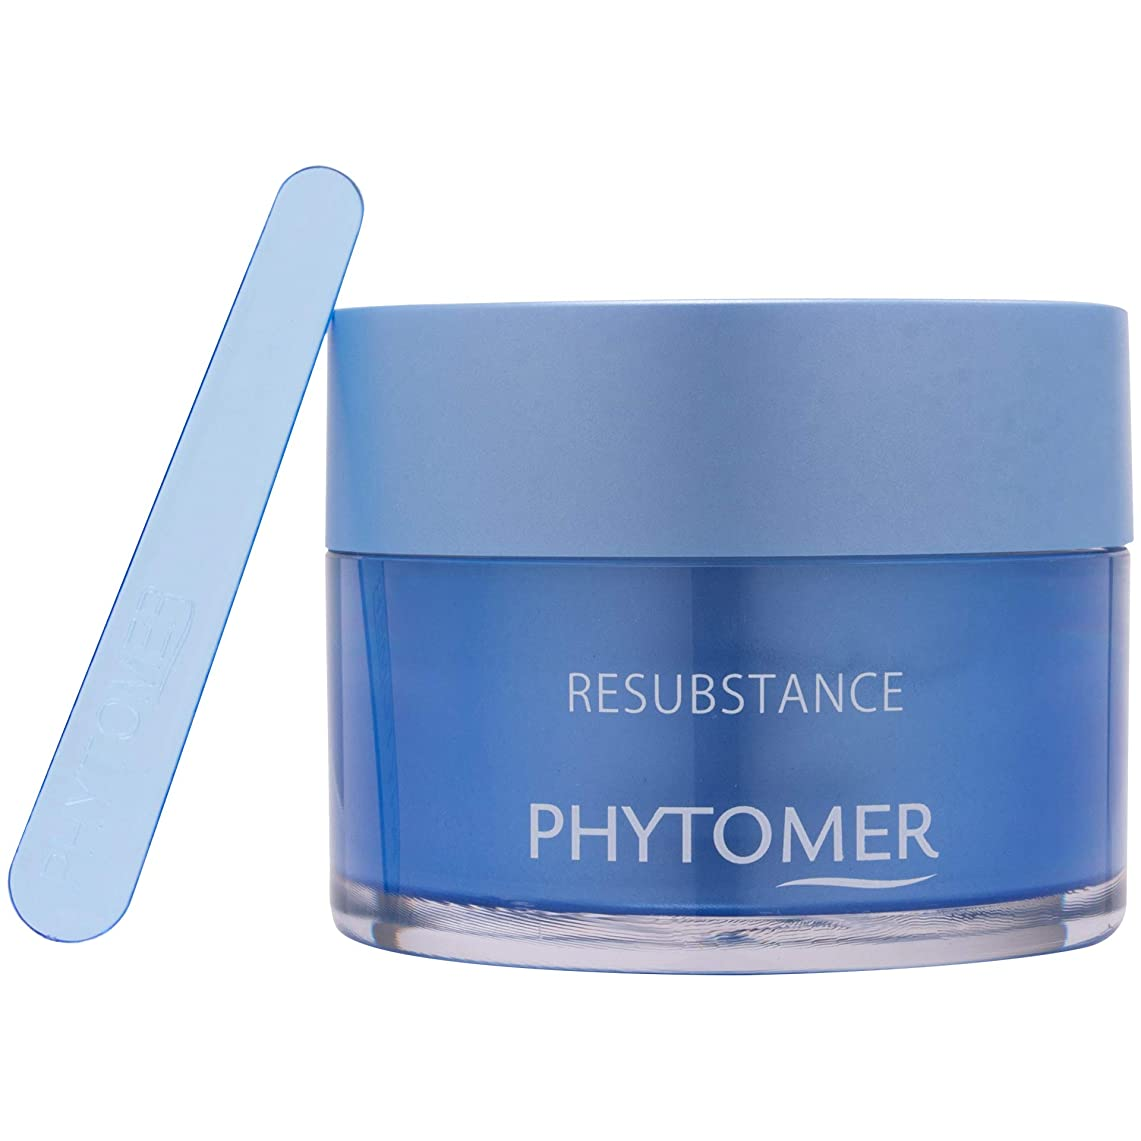 Phytomer Resubstance Skin Resilience Rich Cream 50ml/1.6oz並行輸入品